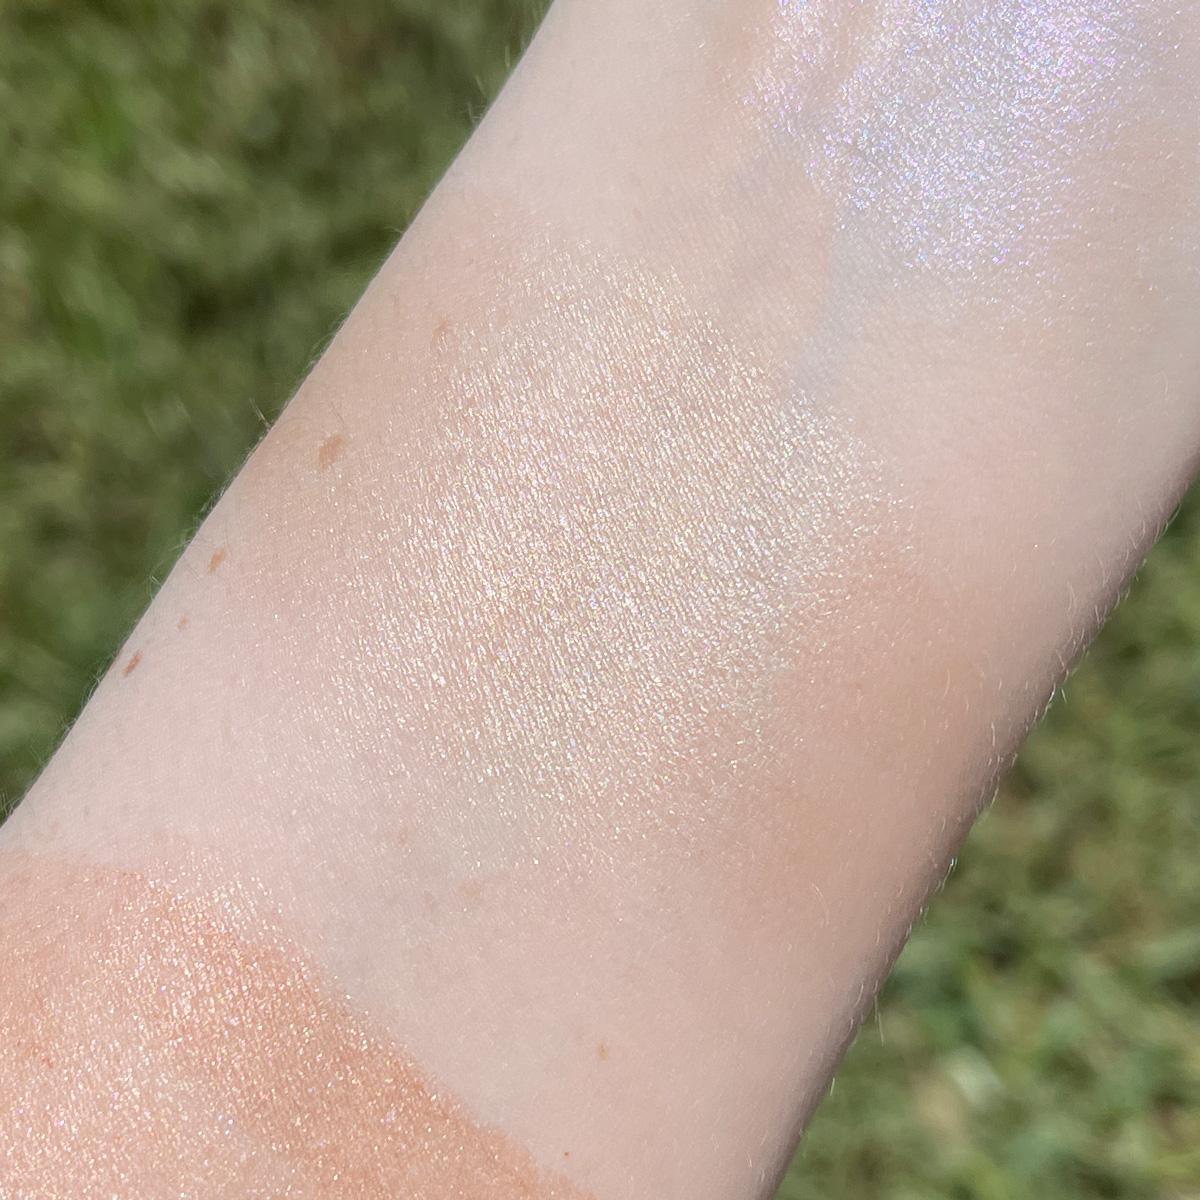 Tidal Lime Crime Skin Stick Swatched on Light Skin